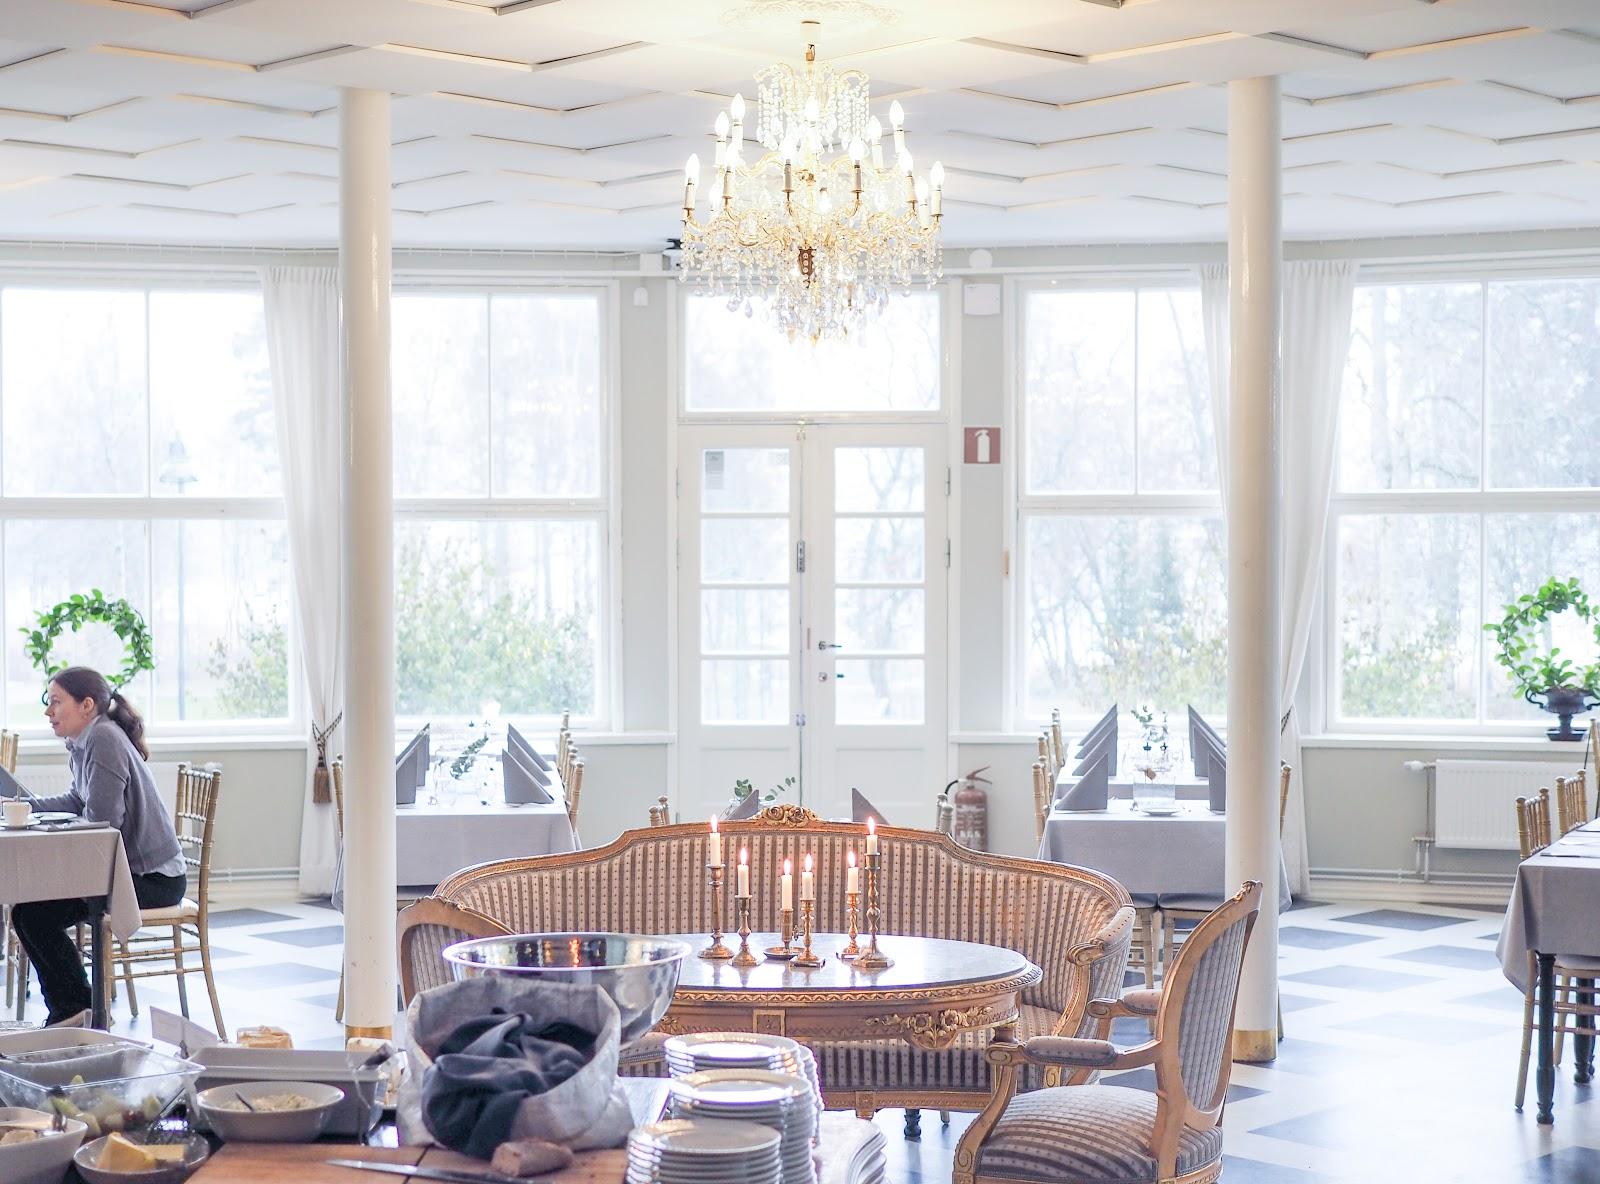 Villa Sandviken Brunch – Brunssi kauniissa villassa